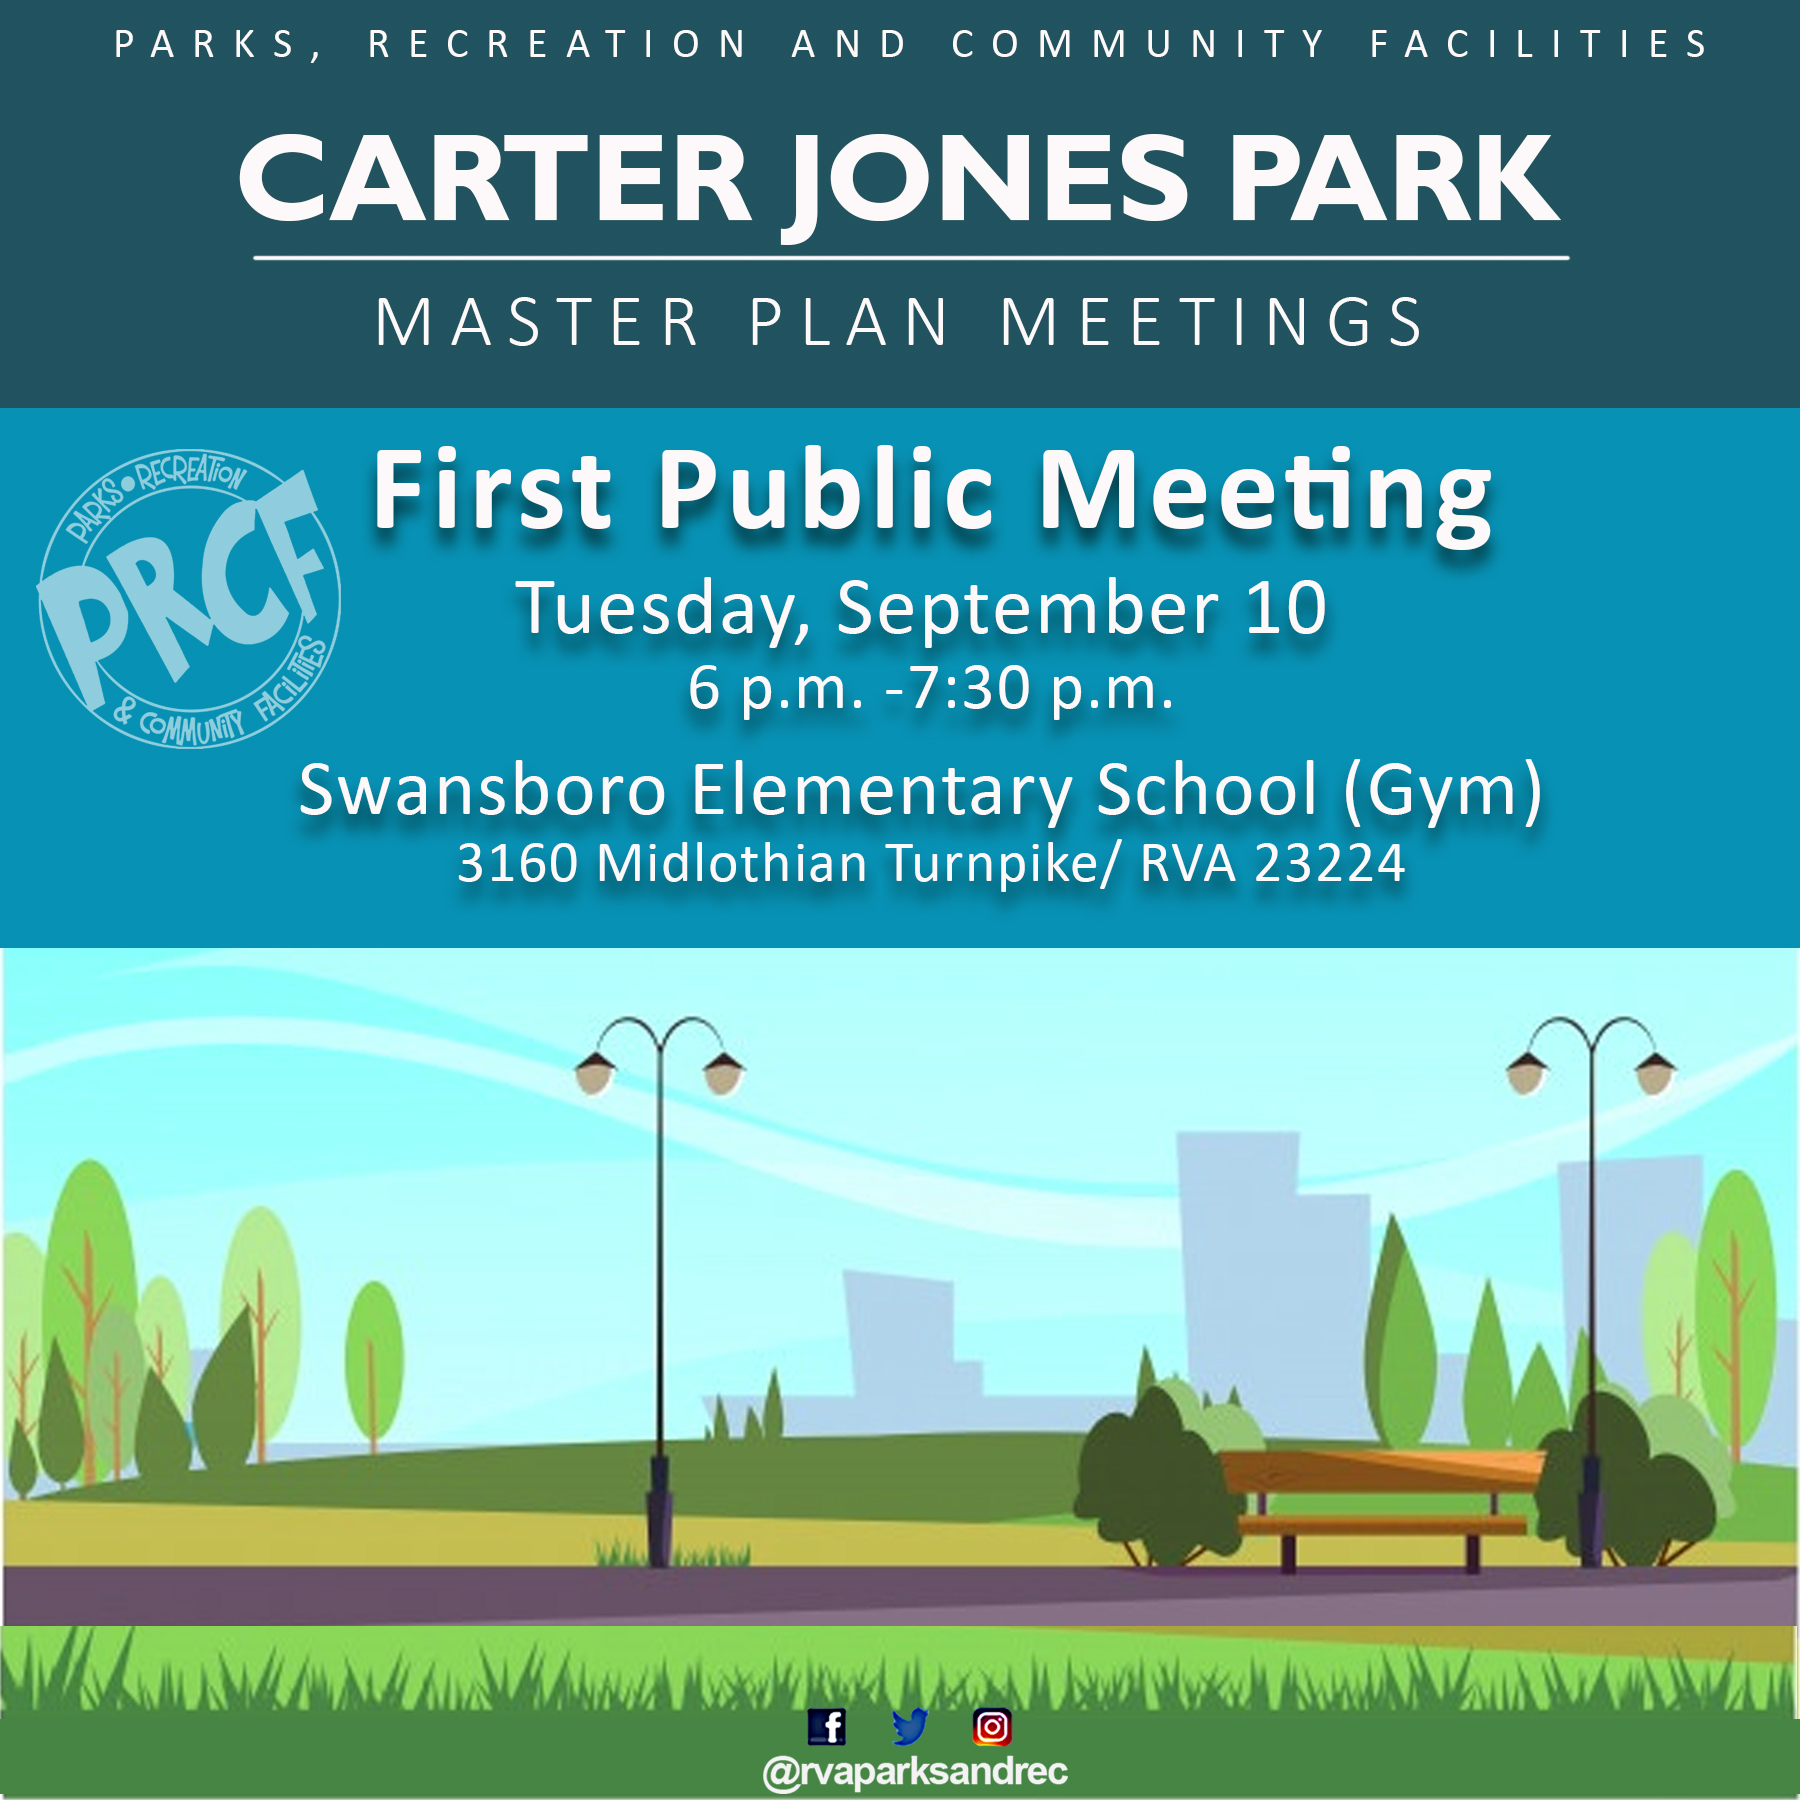 Carter Jones Park Master Planning Public Meeting